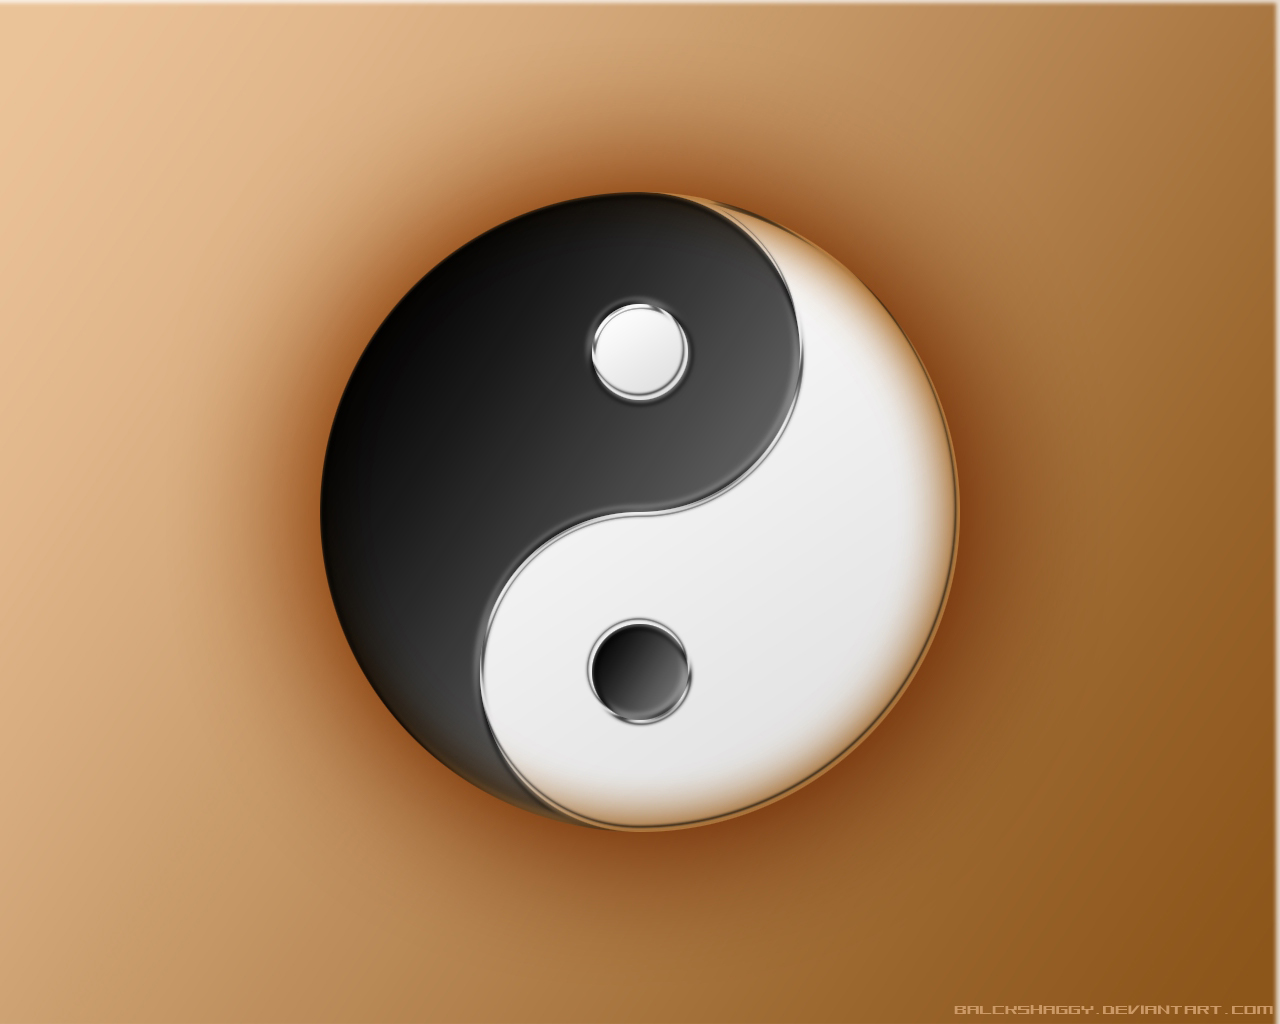 Source URL: http://www.picstopin.com/1280/ying-yang-wallpaper/http:%7C ...